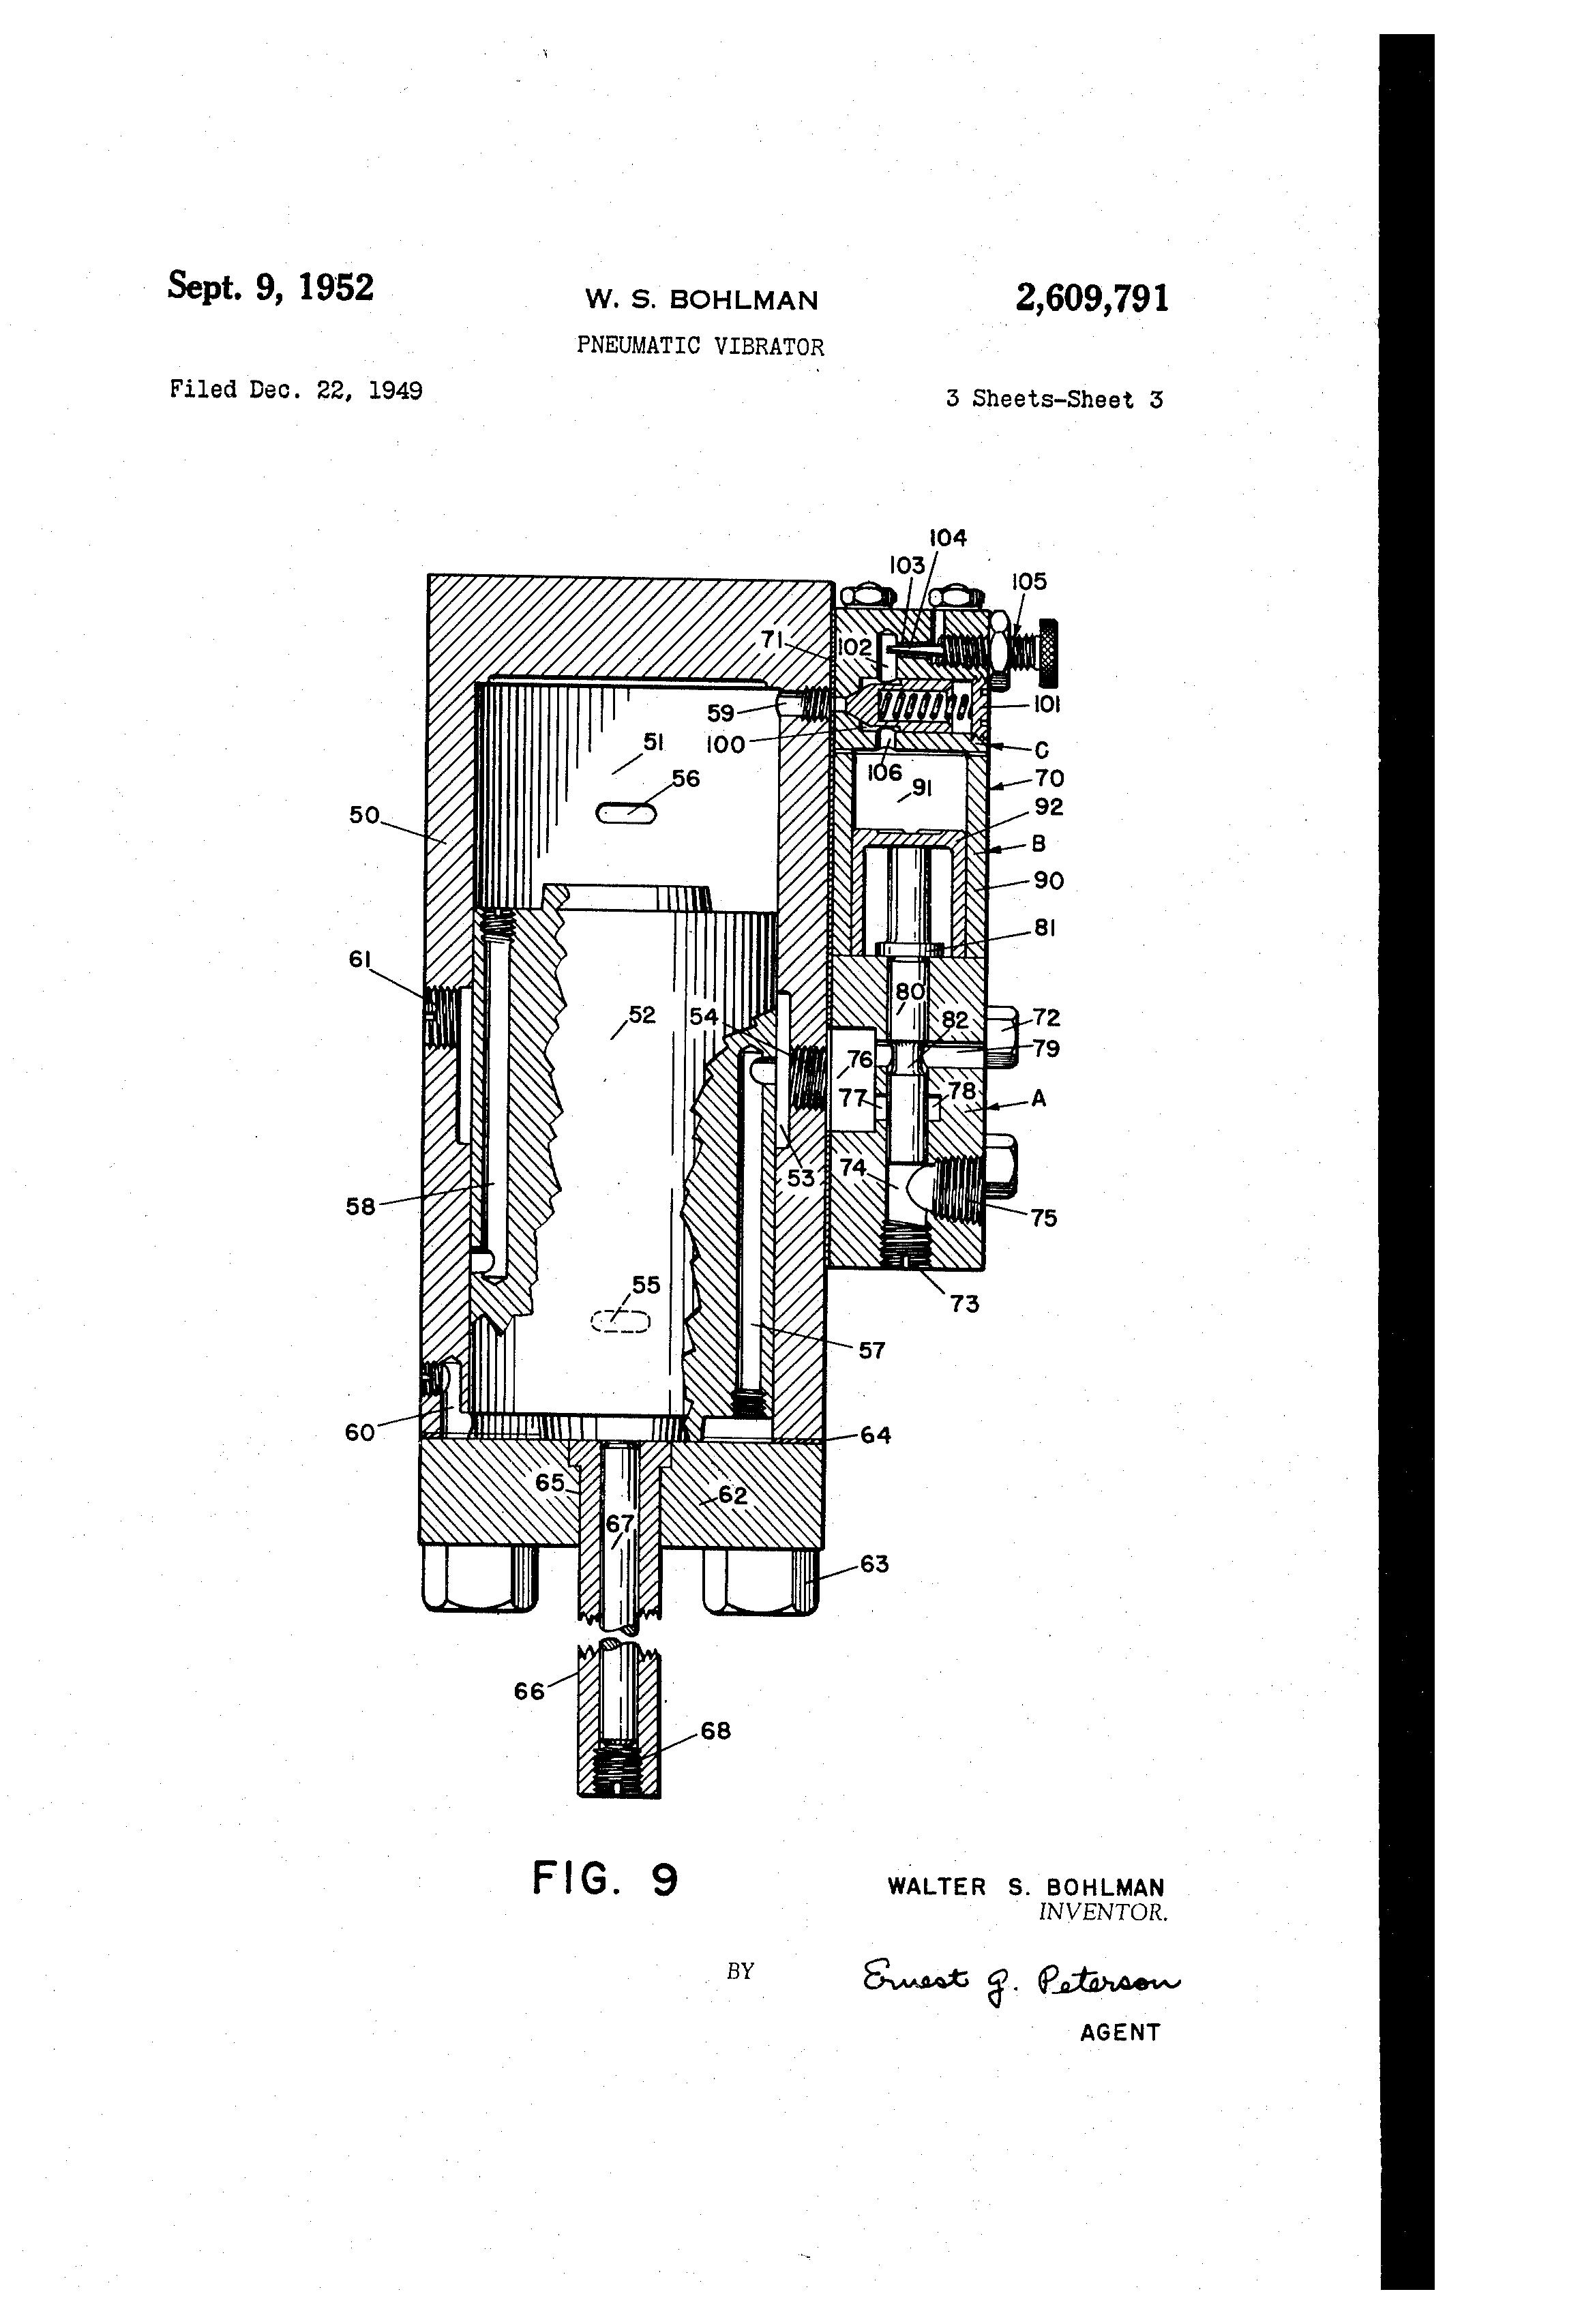 Unique Fire Alarm System Wiring Diagram Gift - Wiring Diagram Ideas ...